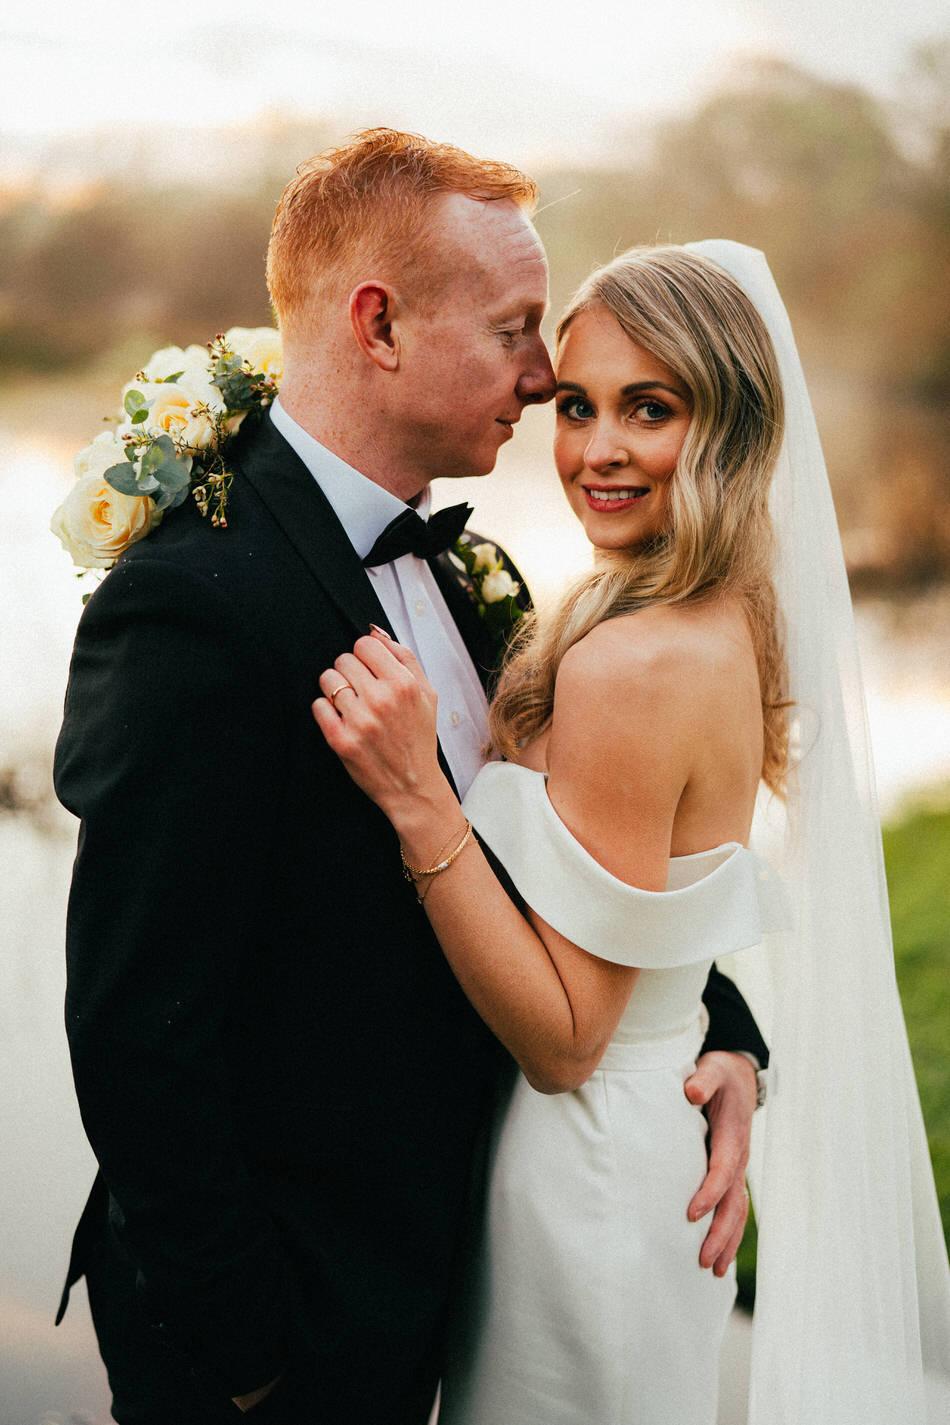 Castle-wedding-ireland-photos- 0227 167